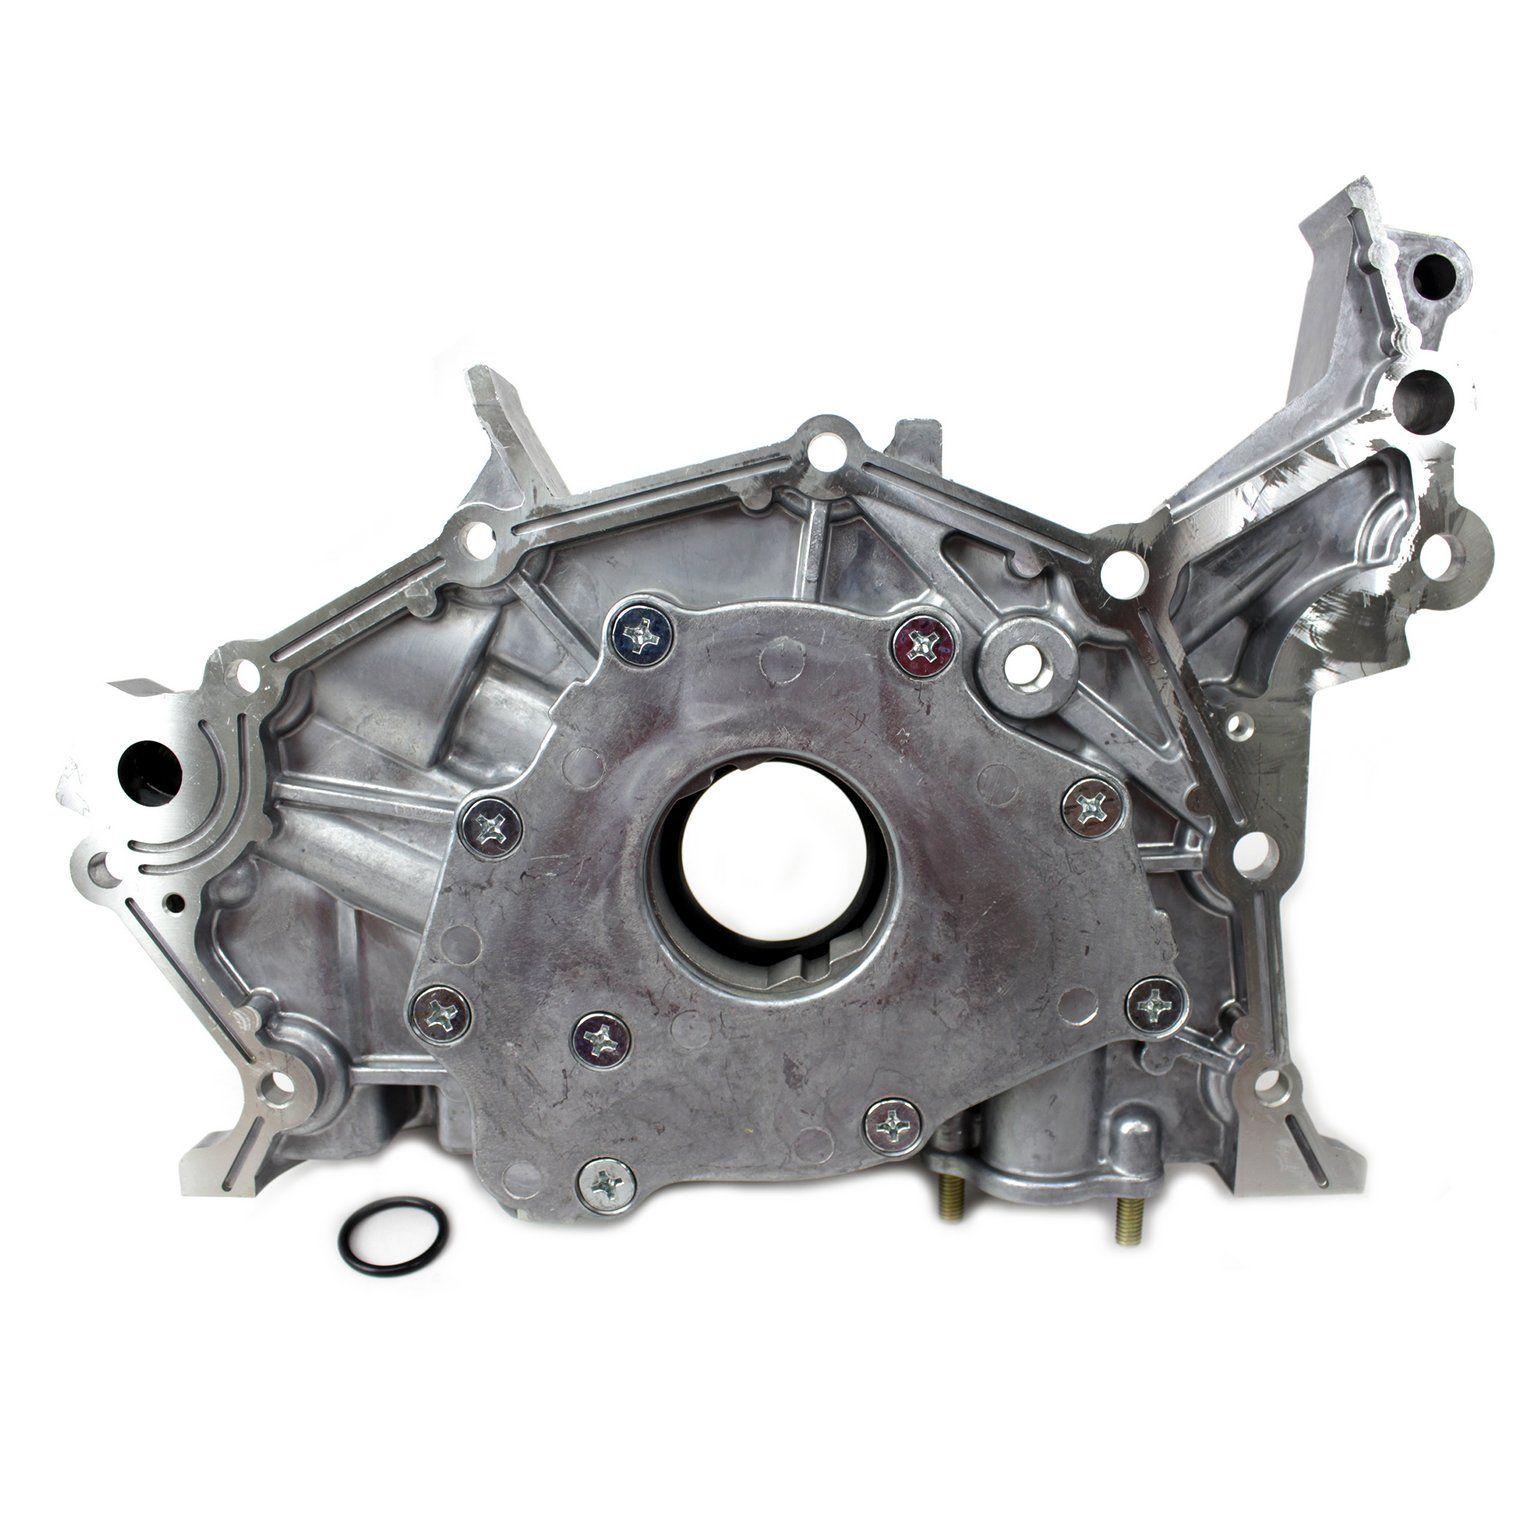 Toyota Solara Engine Oil Pump Replacement Aisin Aisin Dj Rock